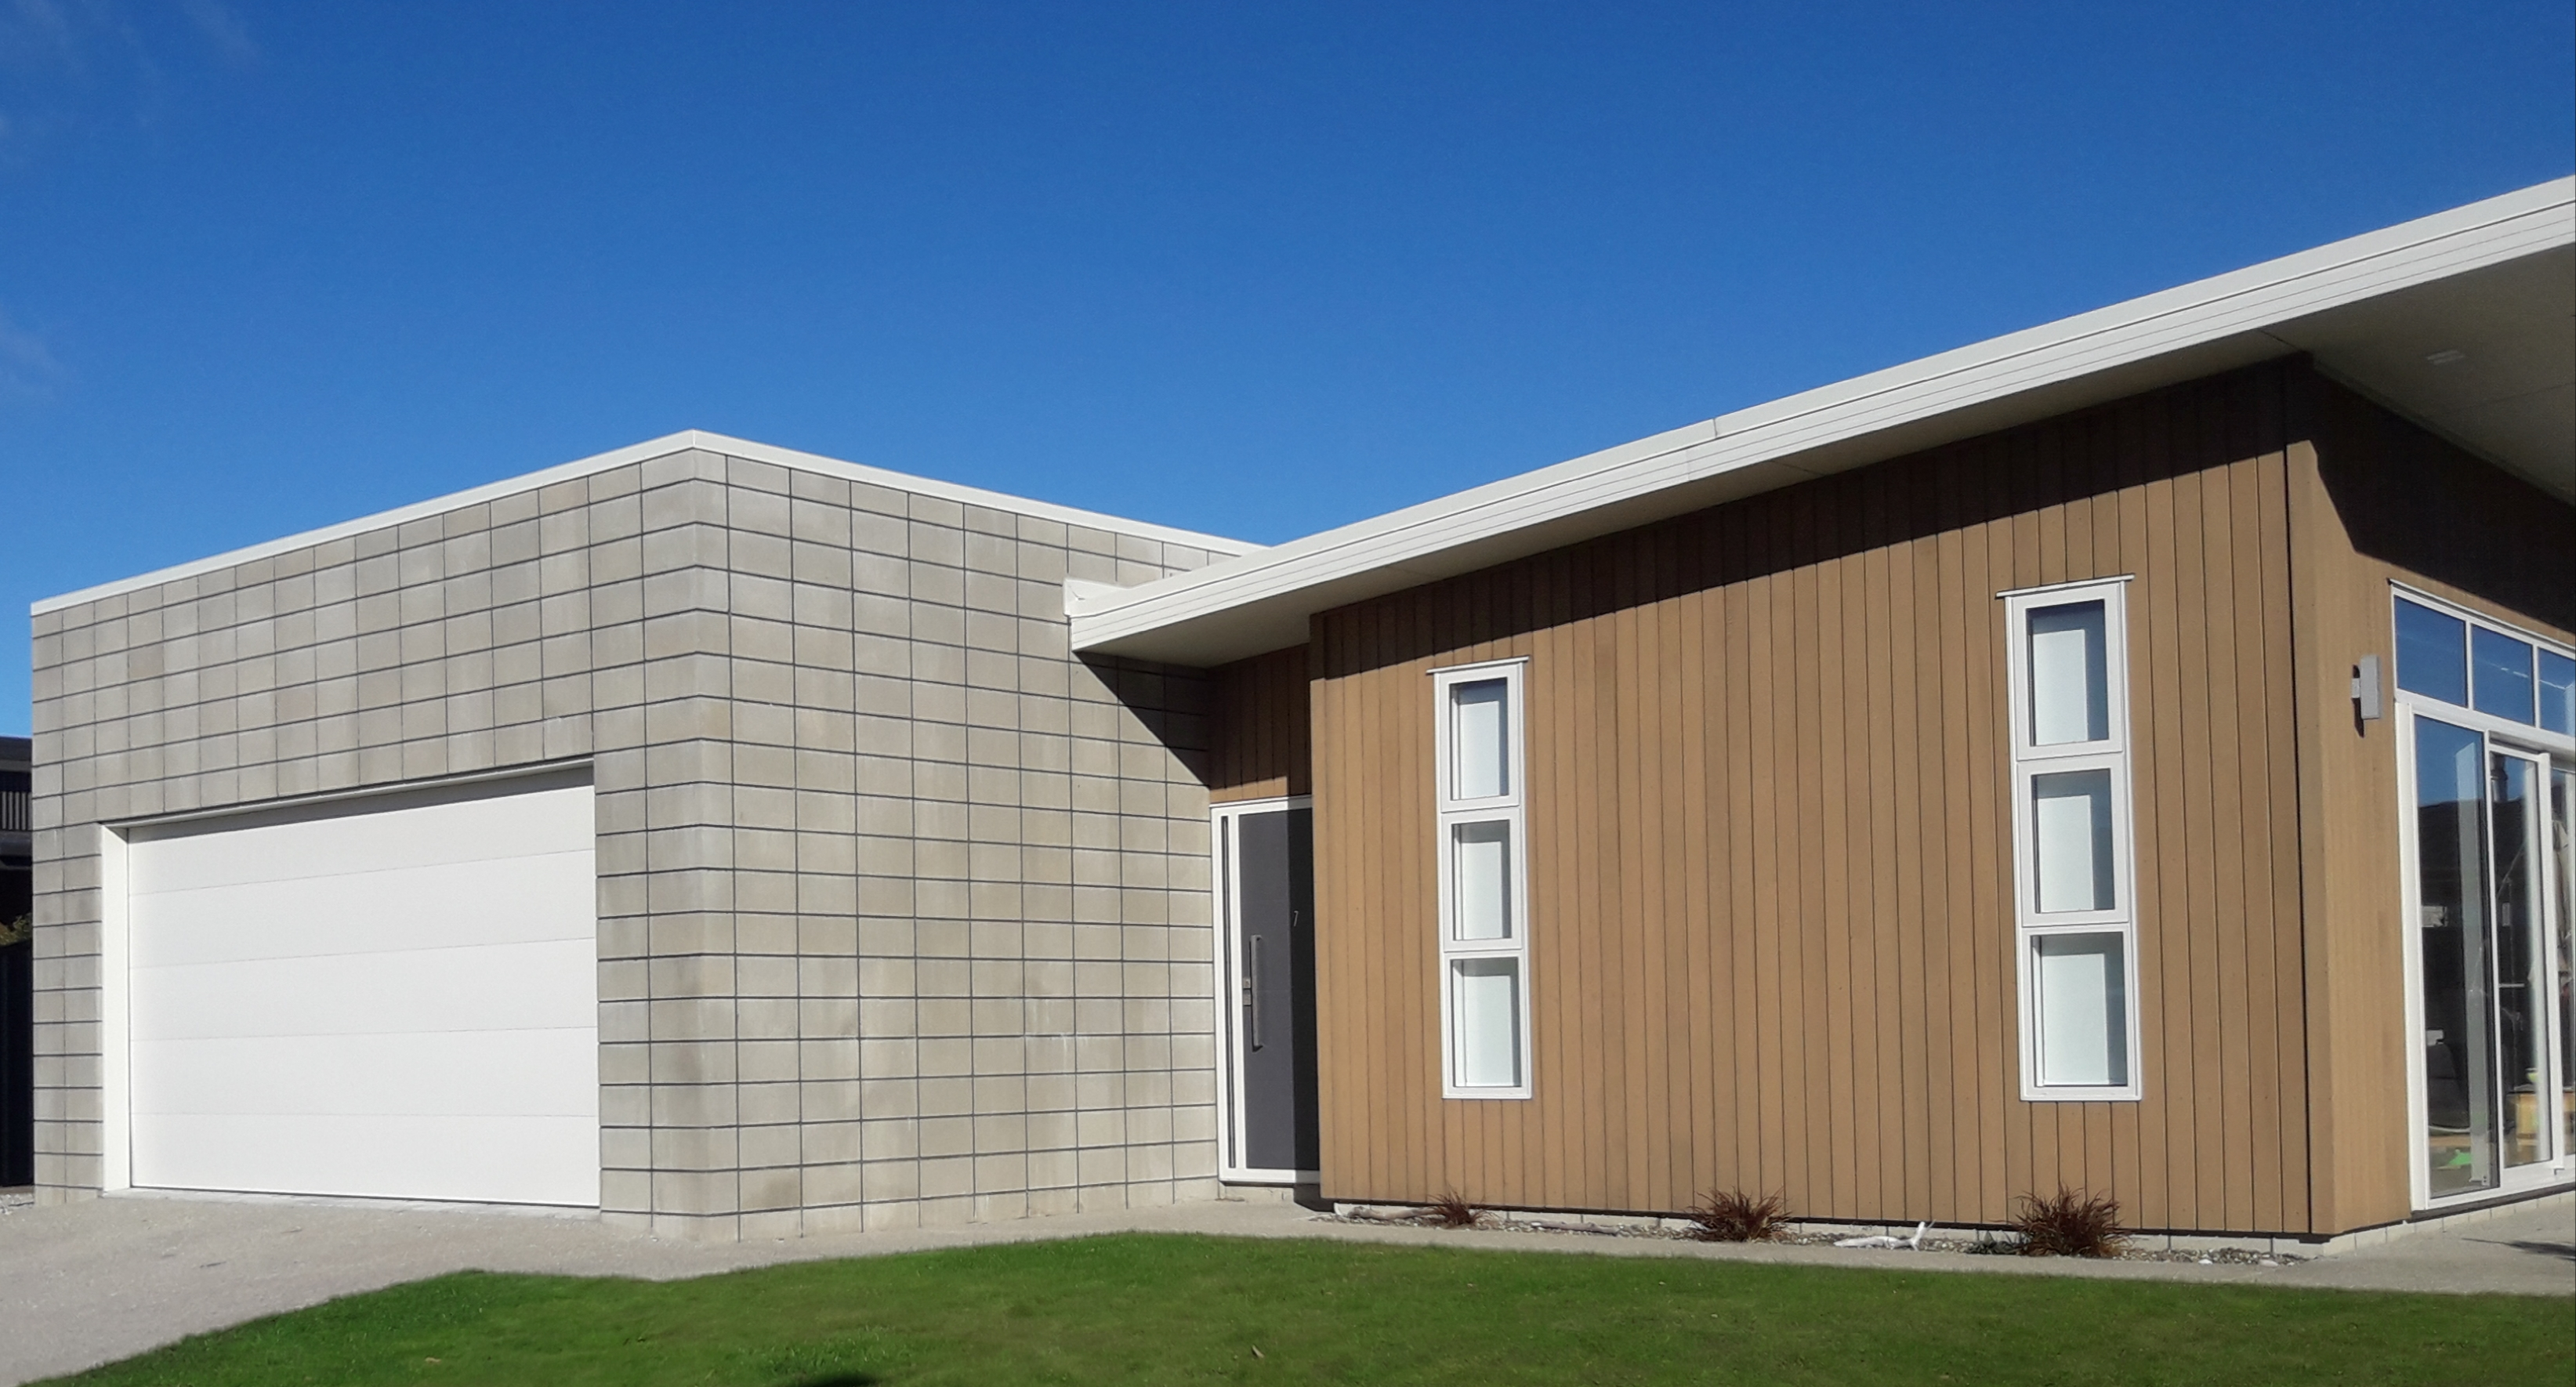 Sleek and Modern Brick Design